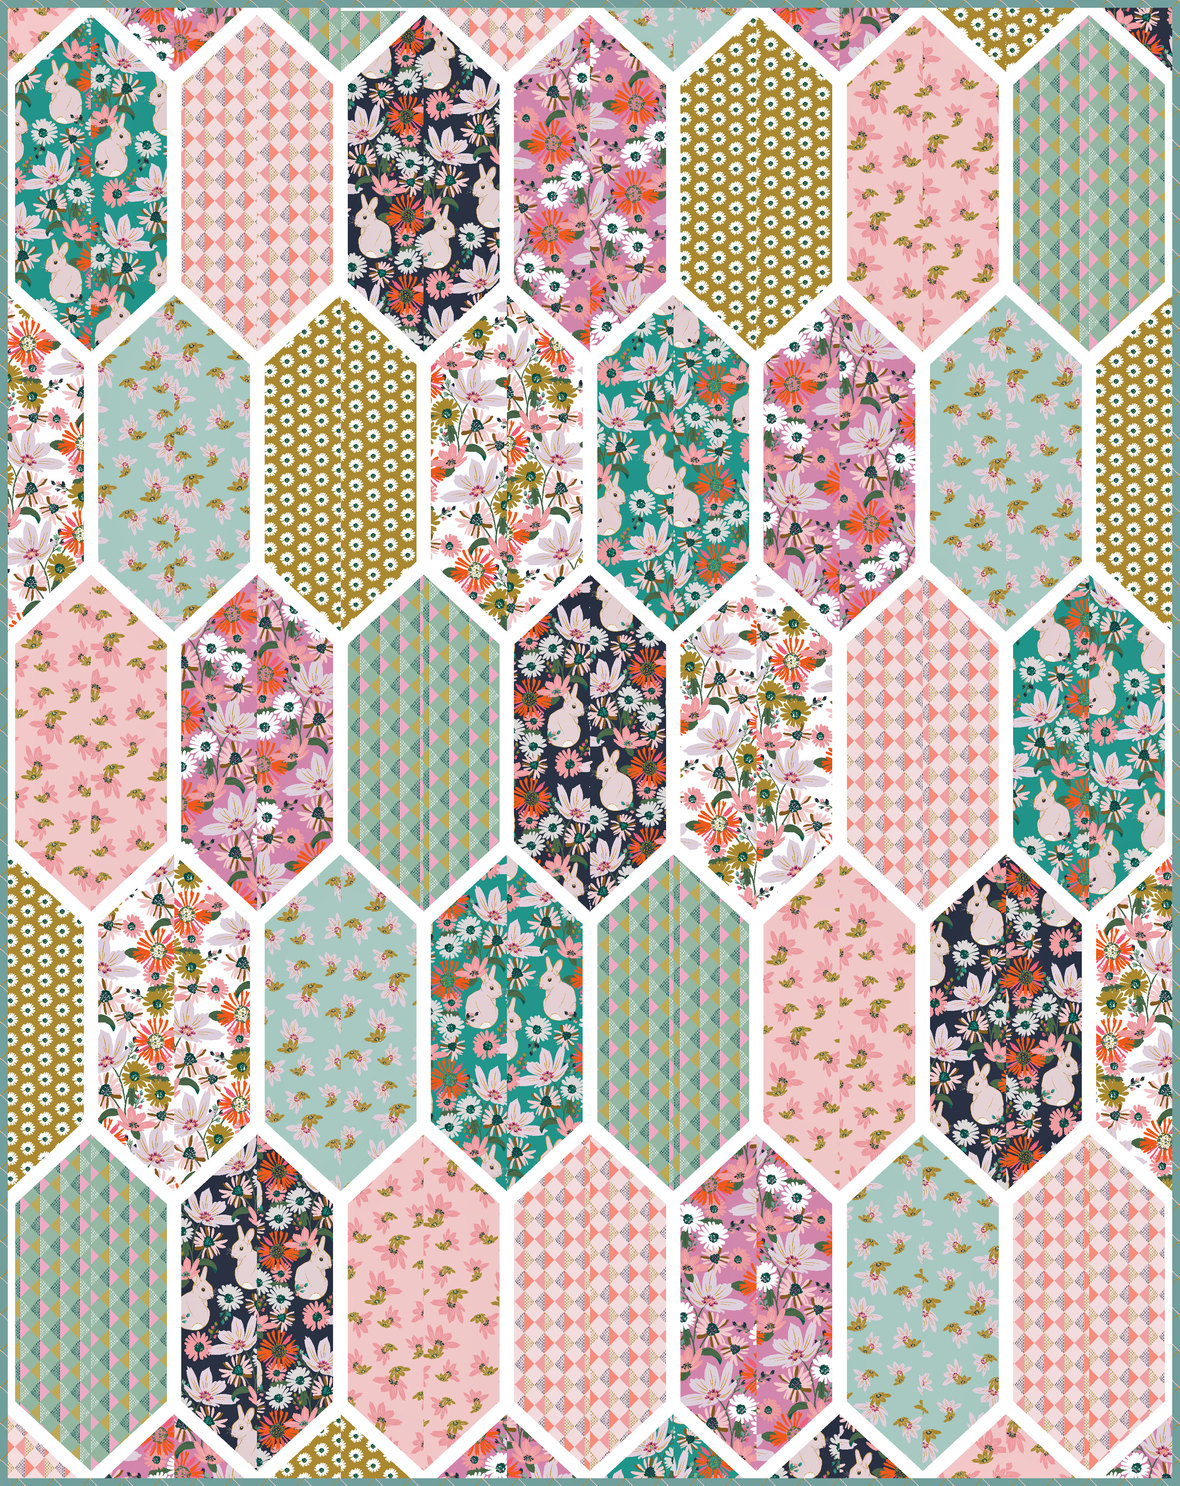 Church-Window-9-half-yards-Bunny-Garden-Fabric-by-Teresa-Chan-for-Hawthorne-Supply-Co